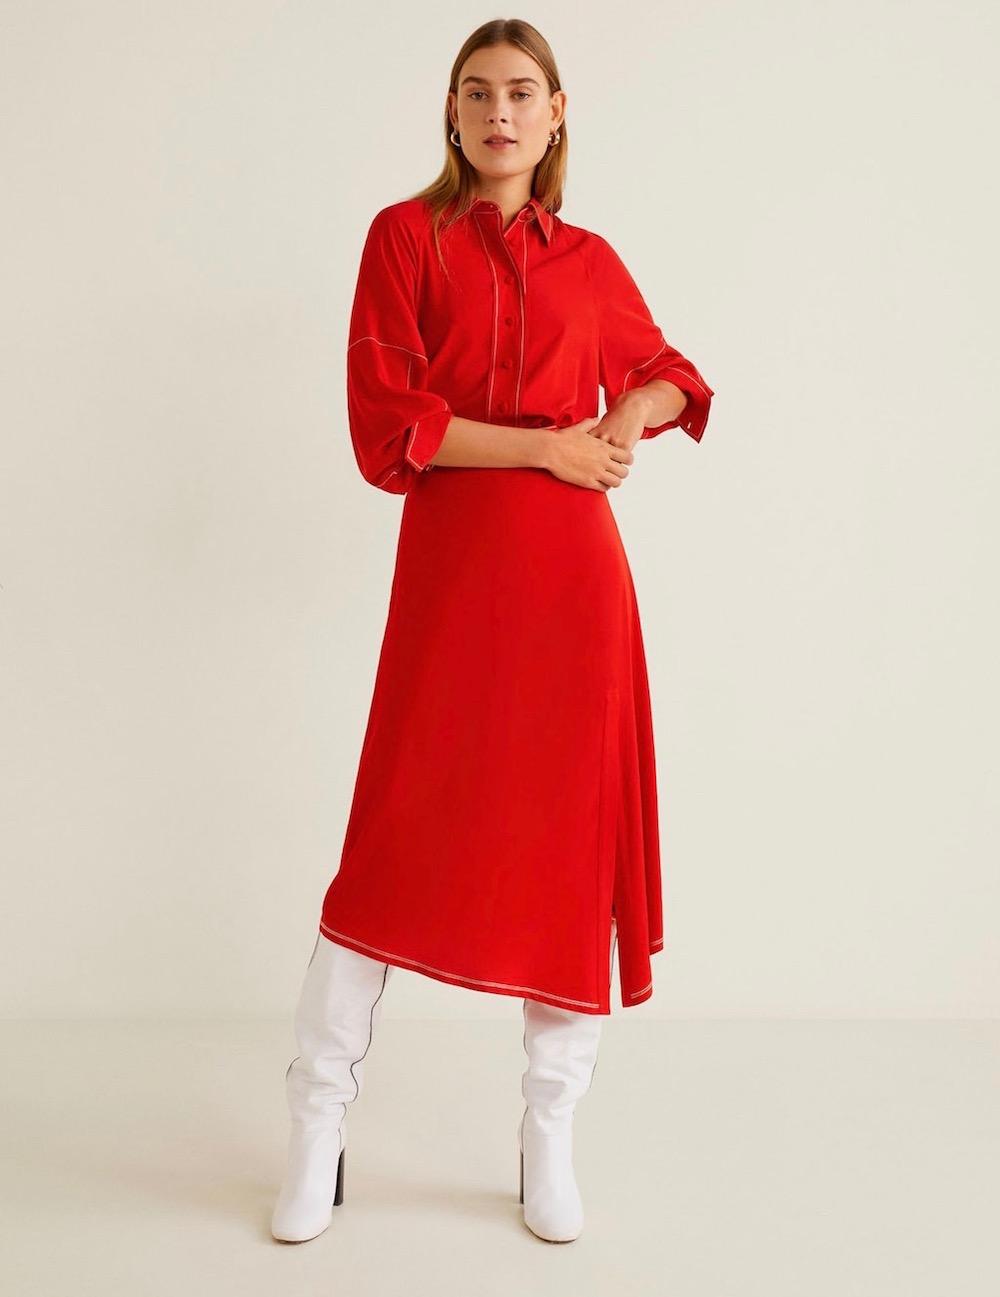 Mango  27 Midi Skirts You Need in Your Closet ASAP Mango Slit Hem Skirt